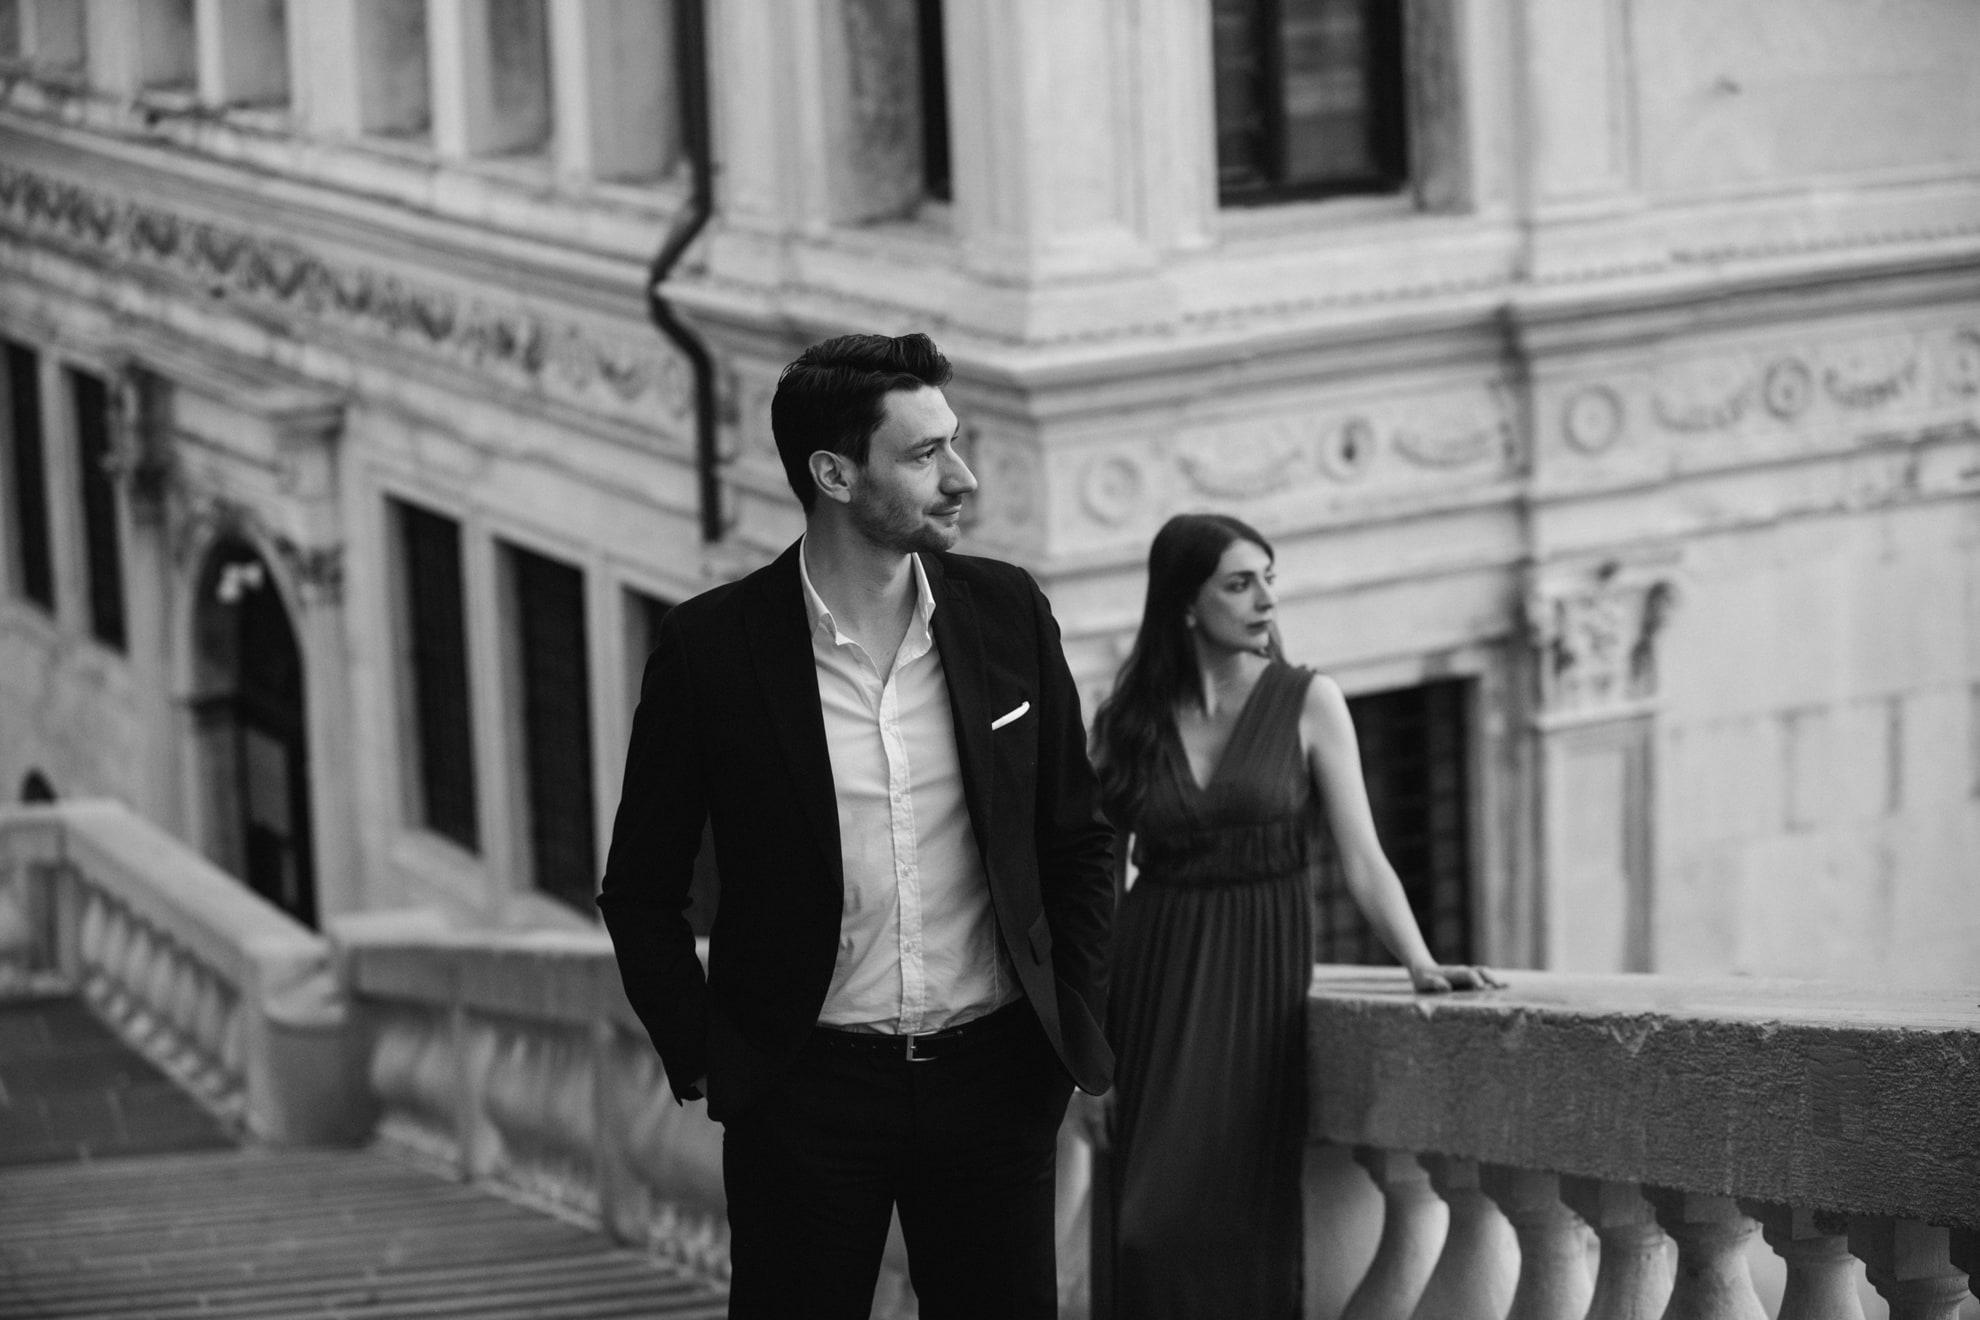 engagement venice venezia proposal proposta matrimonio fidanzamento irene pollacchi fotografa 20